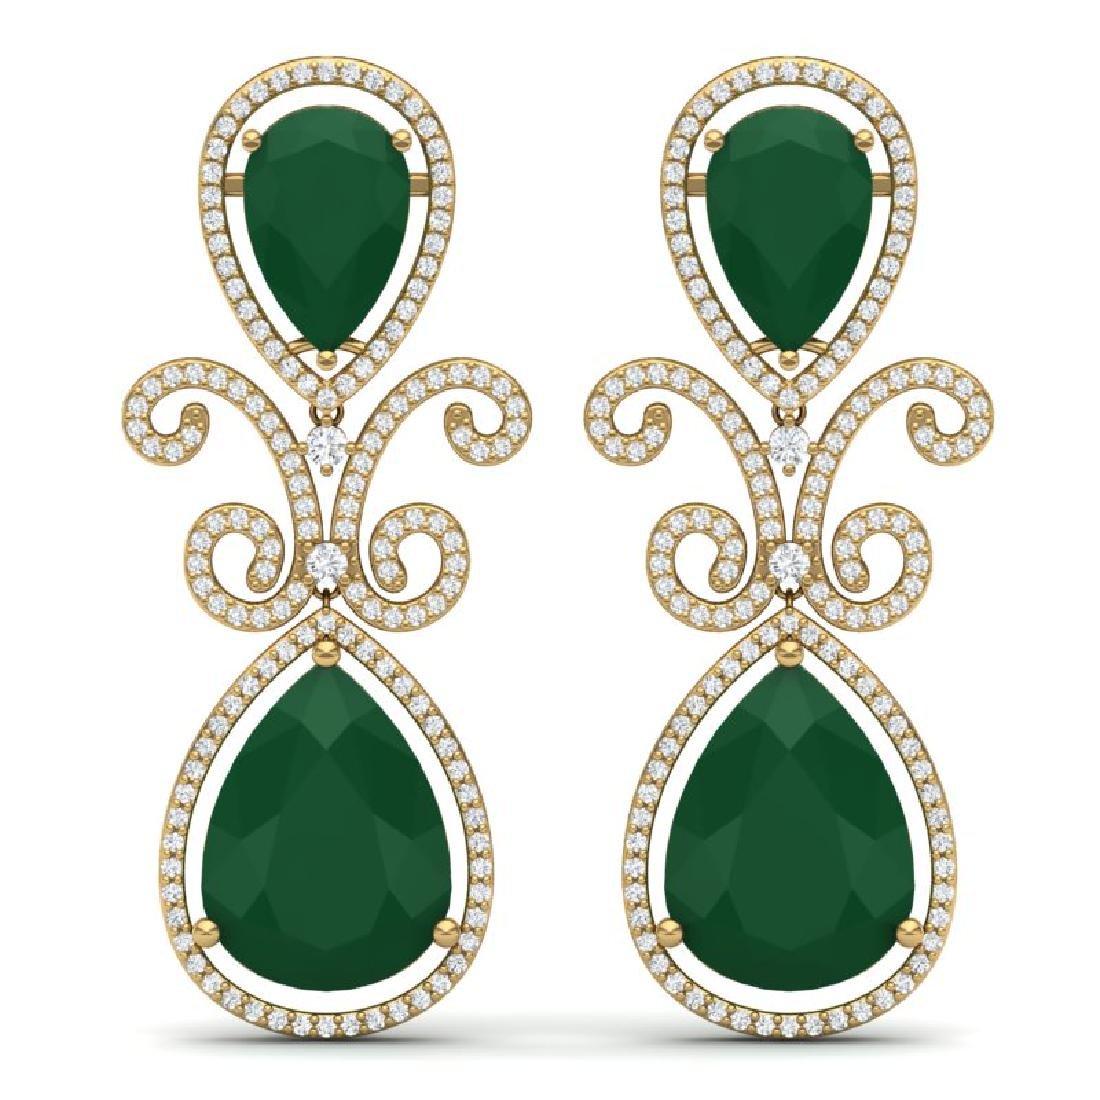 31.6 CTW Royalty Emerald & VS Diamond Earrings 18K